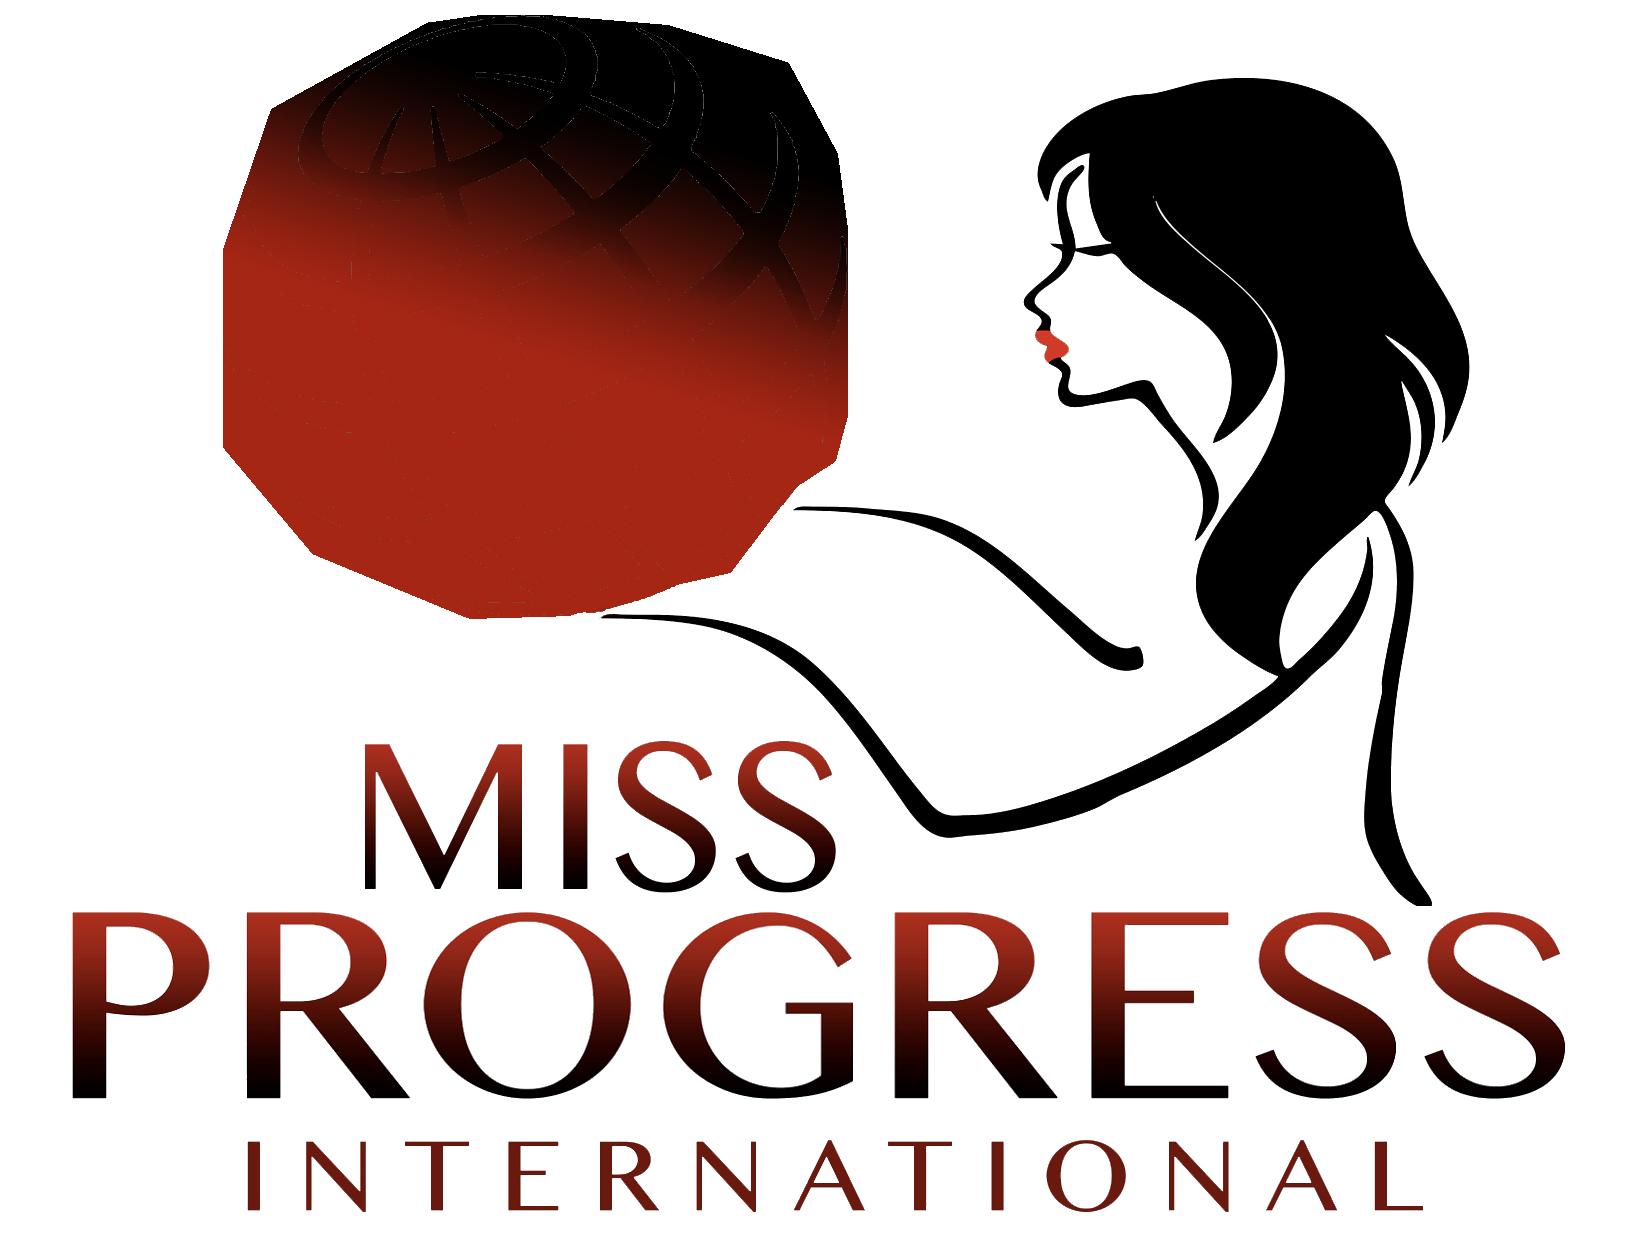 Miss Progress International logo